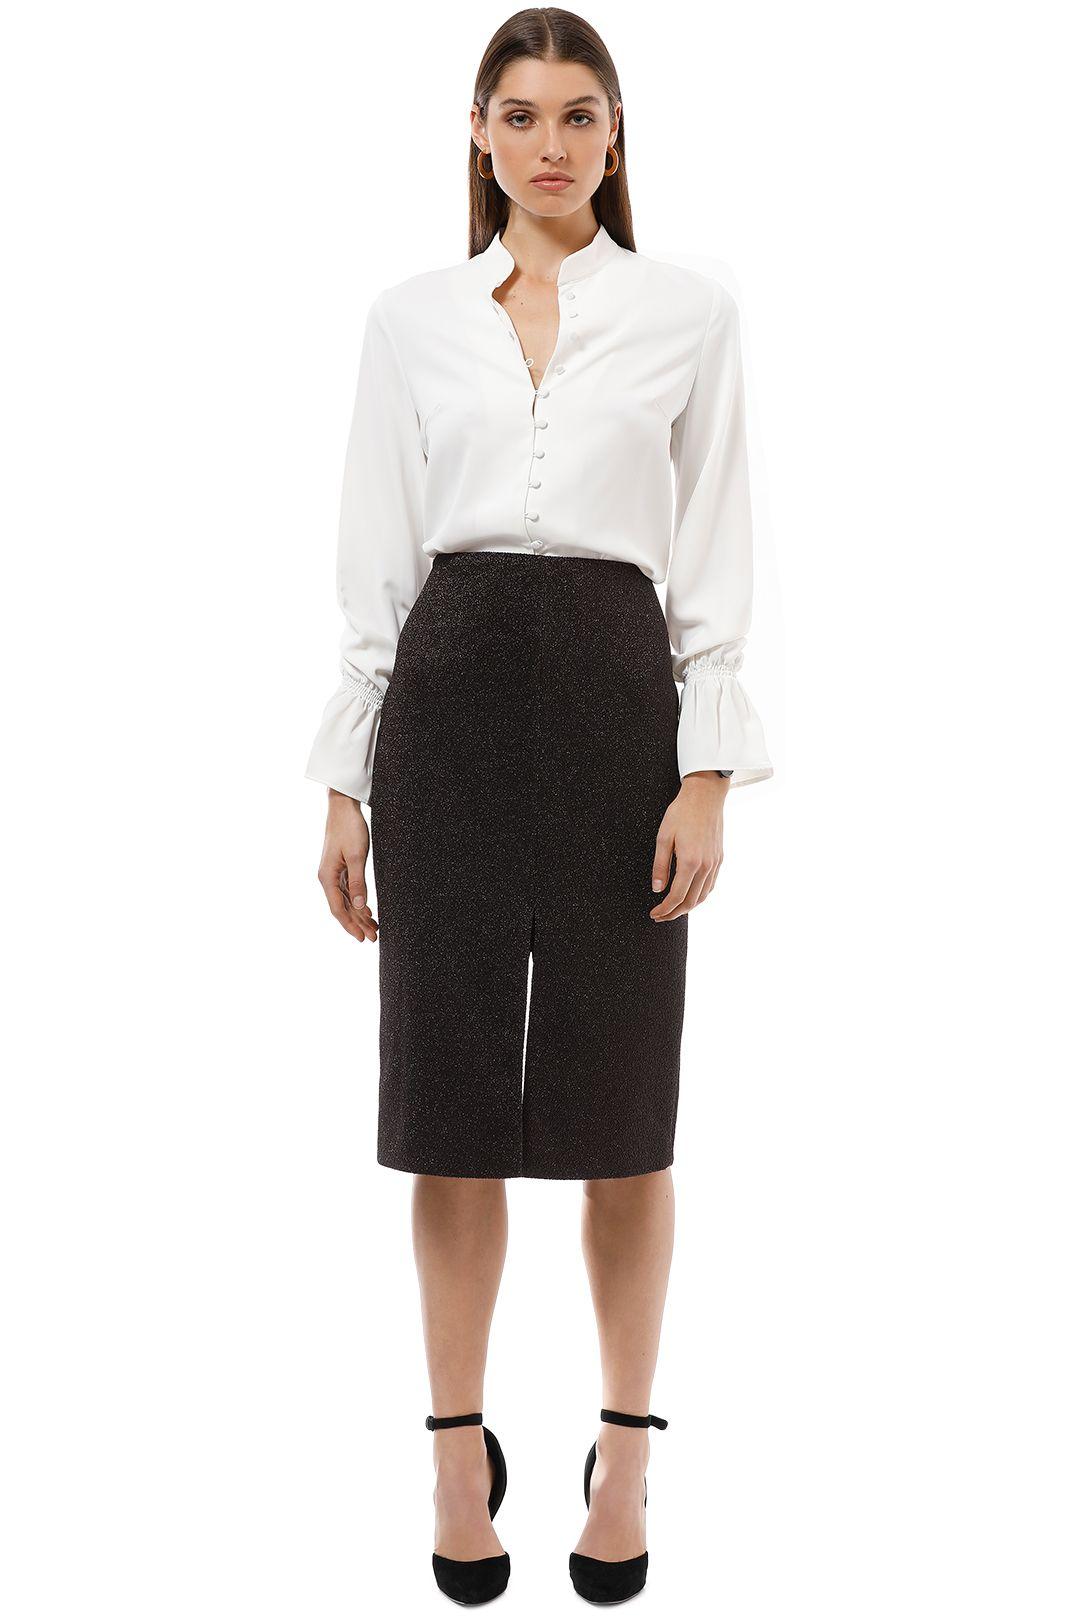 Ginger and Smart - Spectre Skirt - Deep Plum - Front